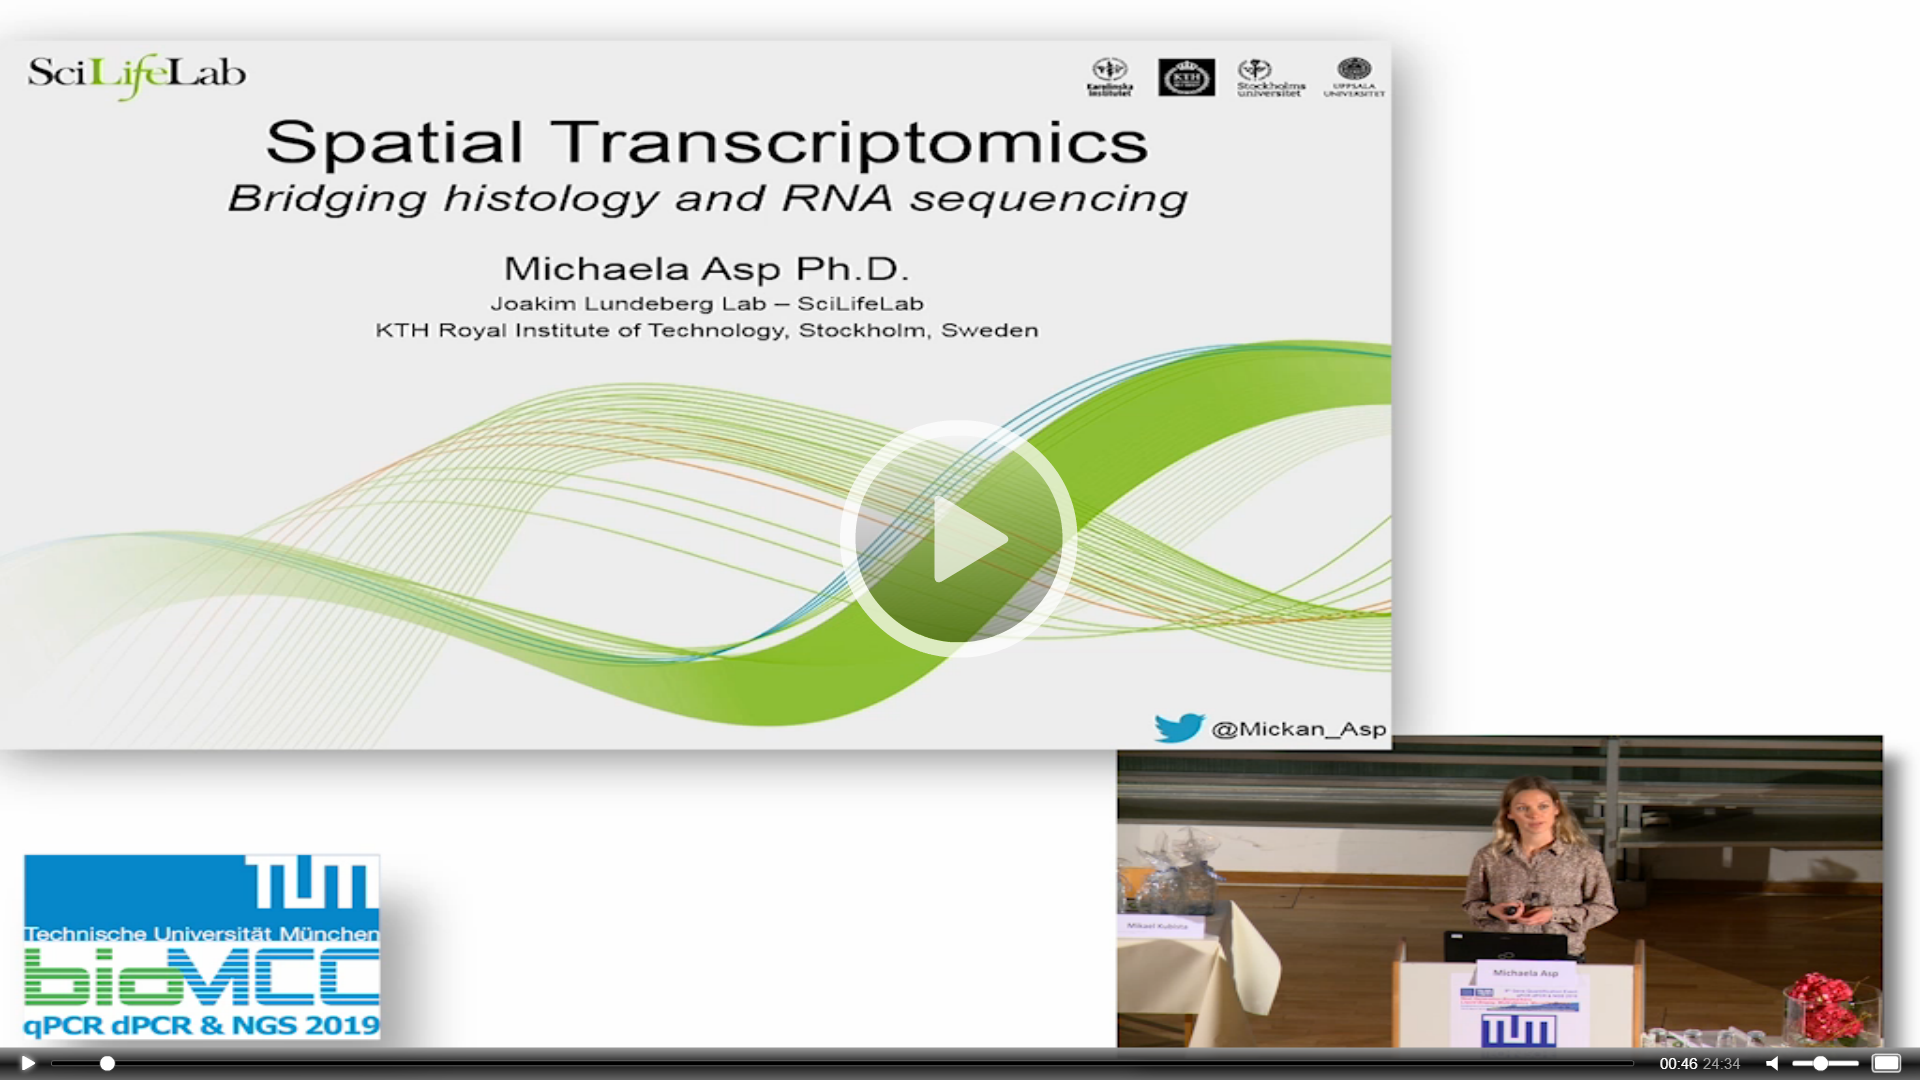 Spatial Transcriptomics - Bridging Histology and RNA Sequencing